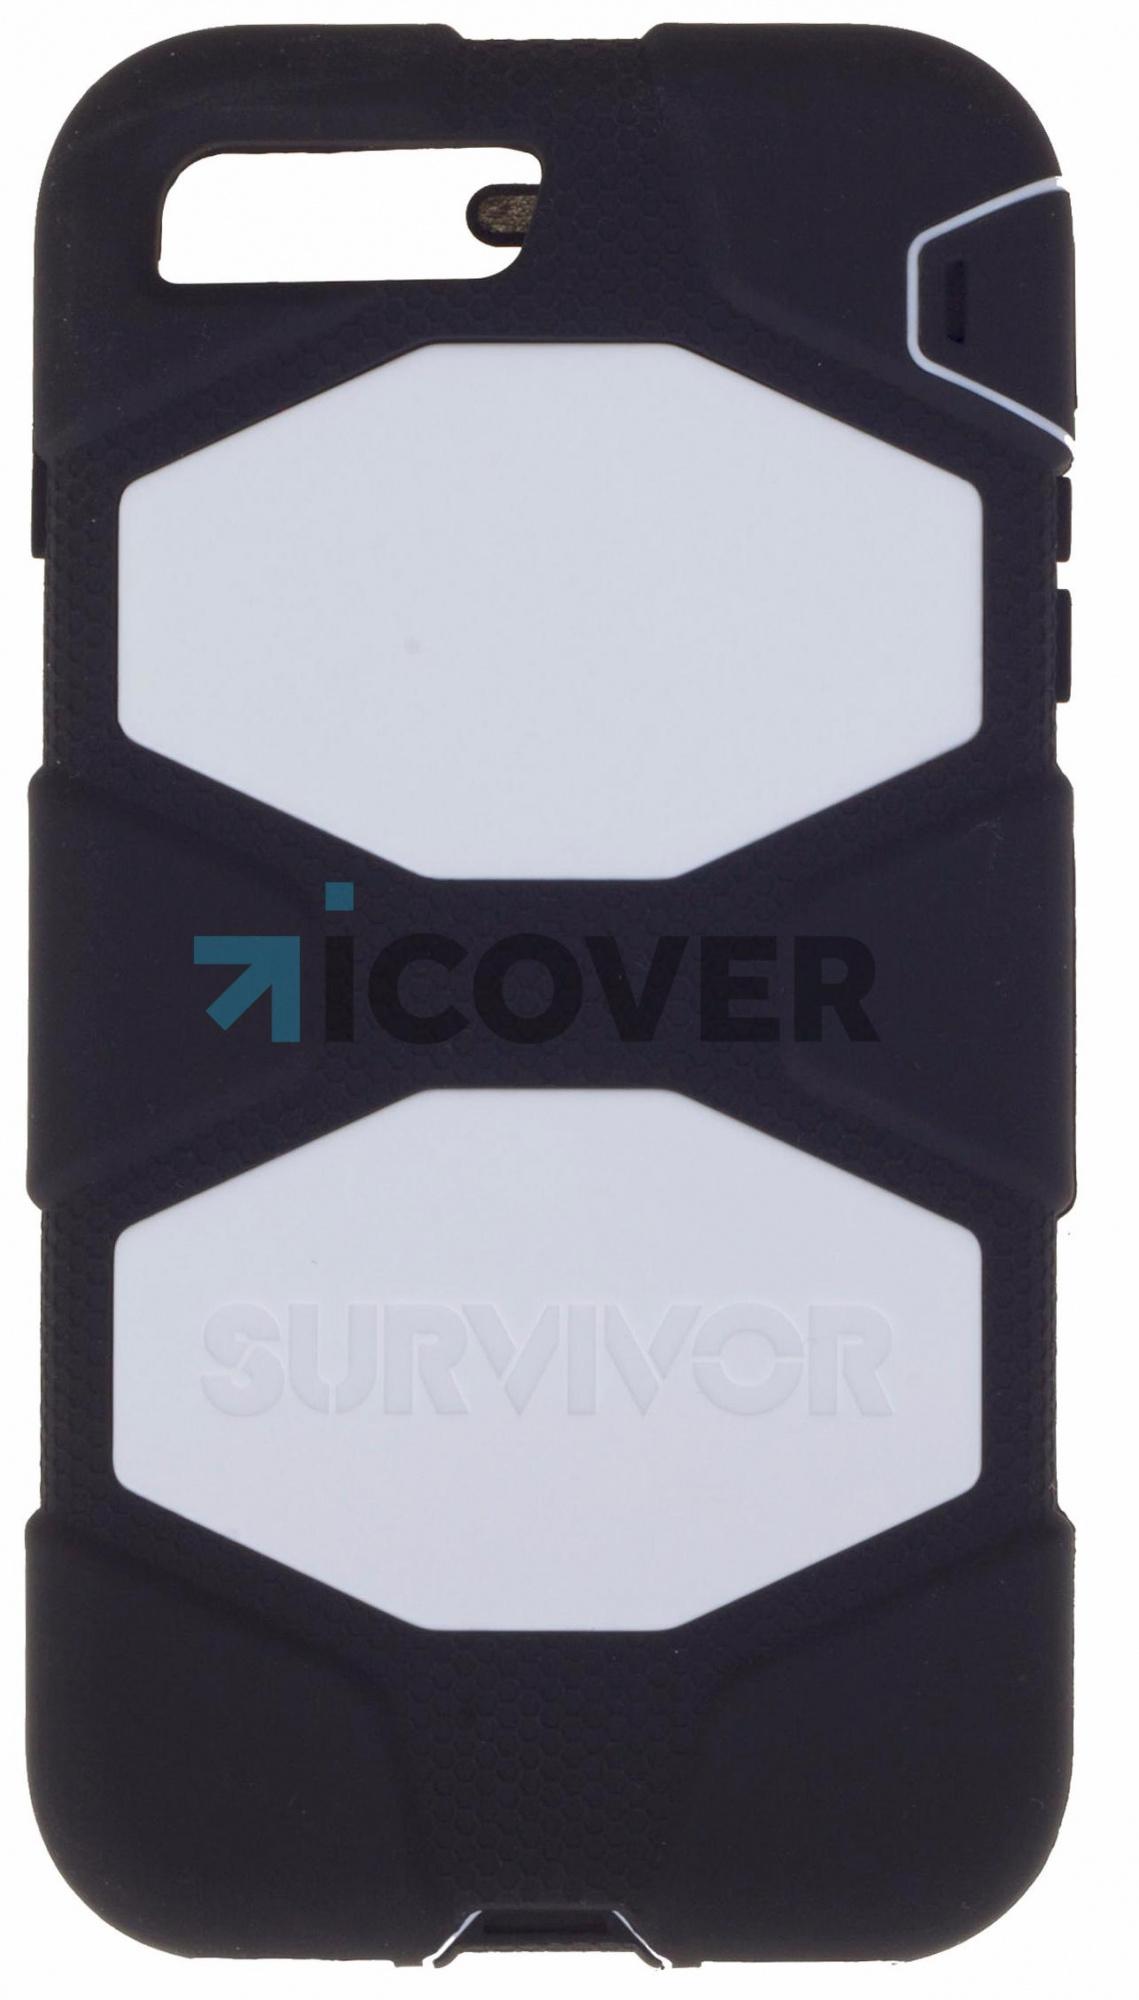 Griffin Survivor - противоударный чехол для iPhone 7 Plus (Black/White)